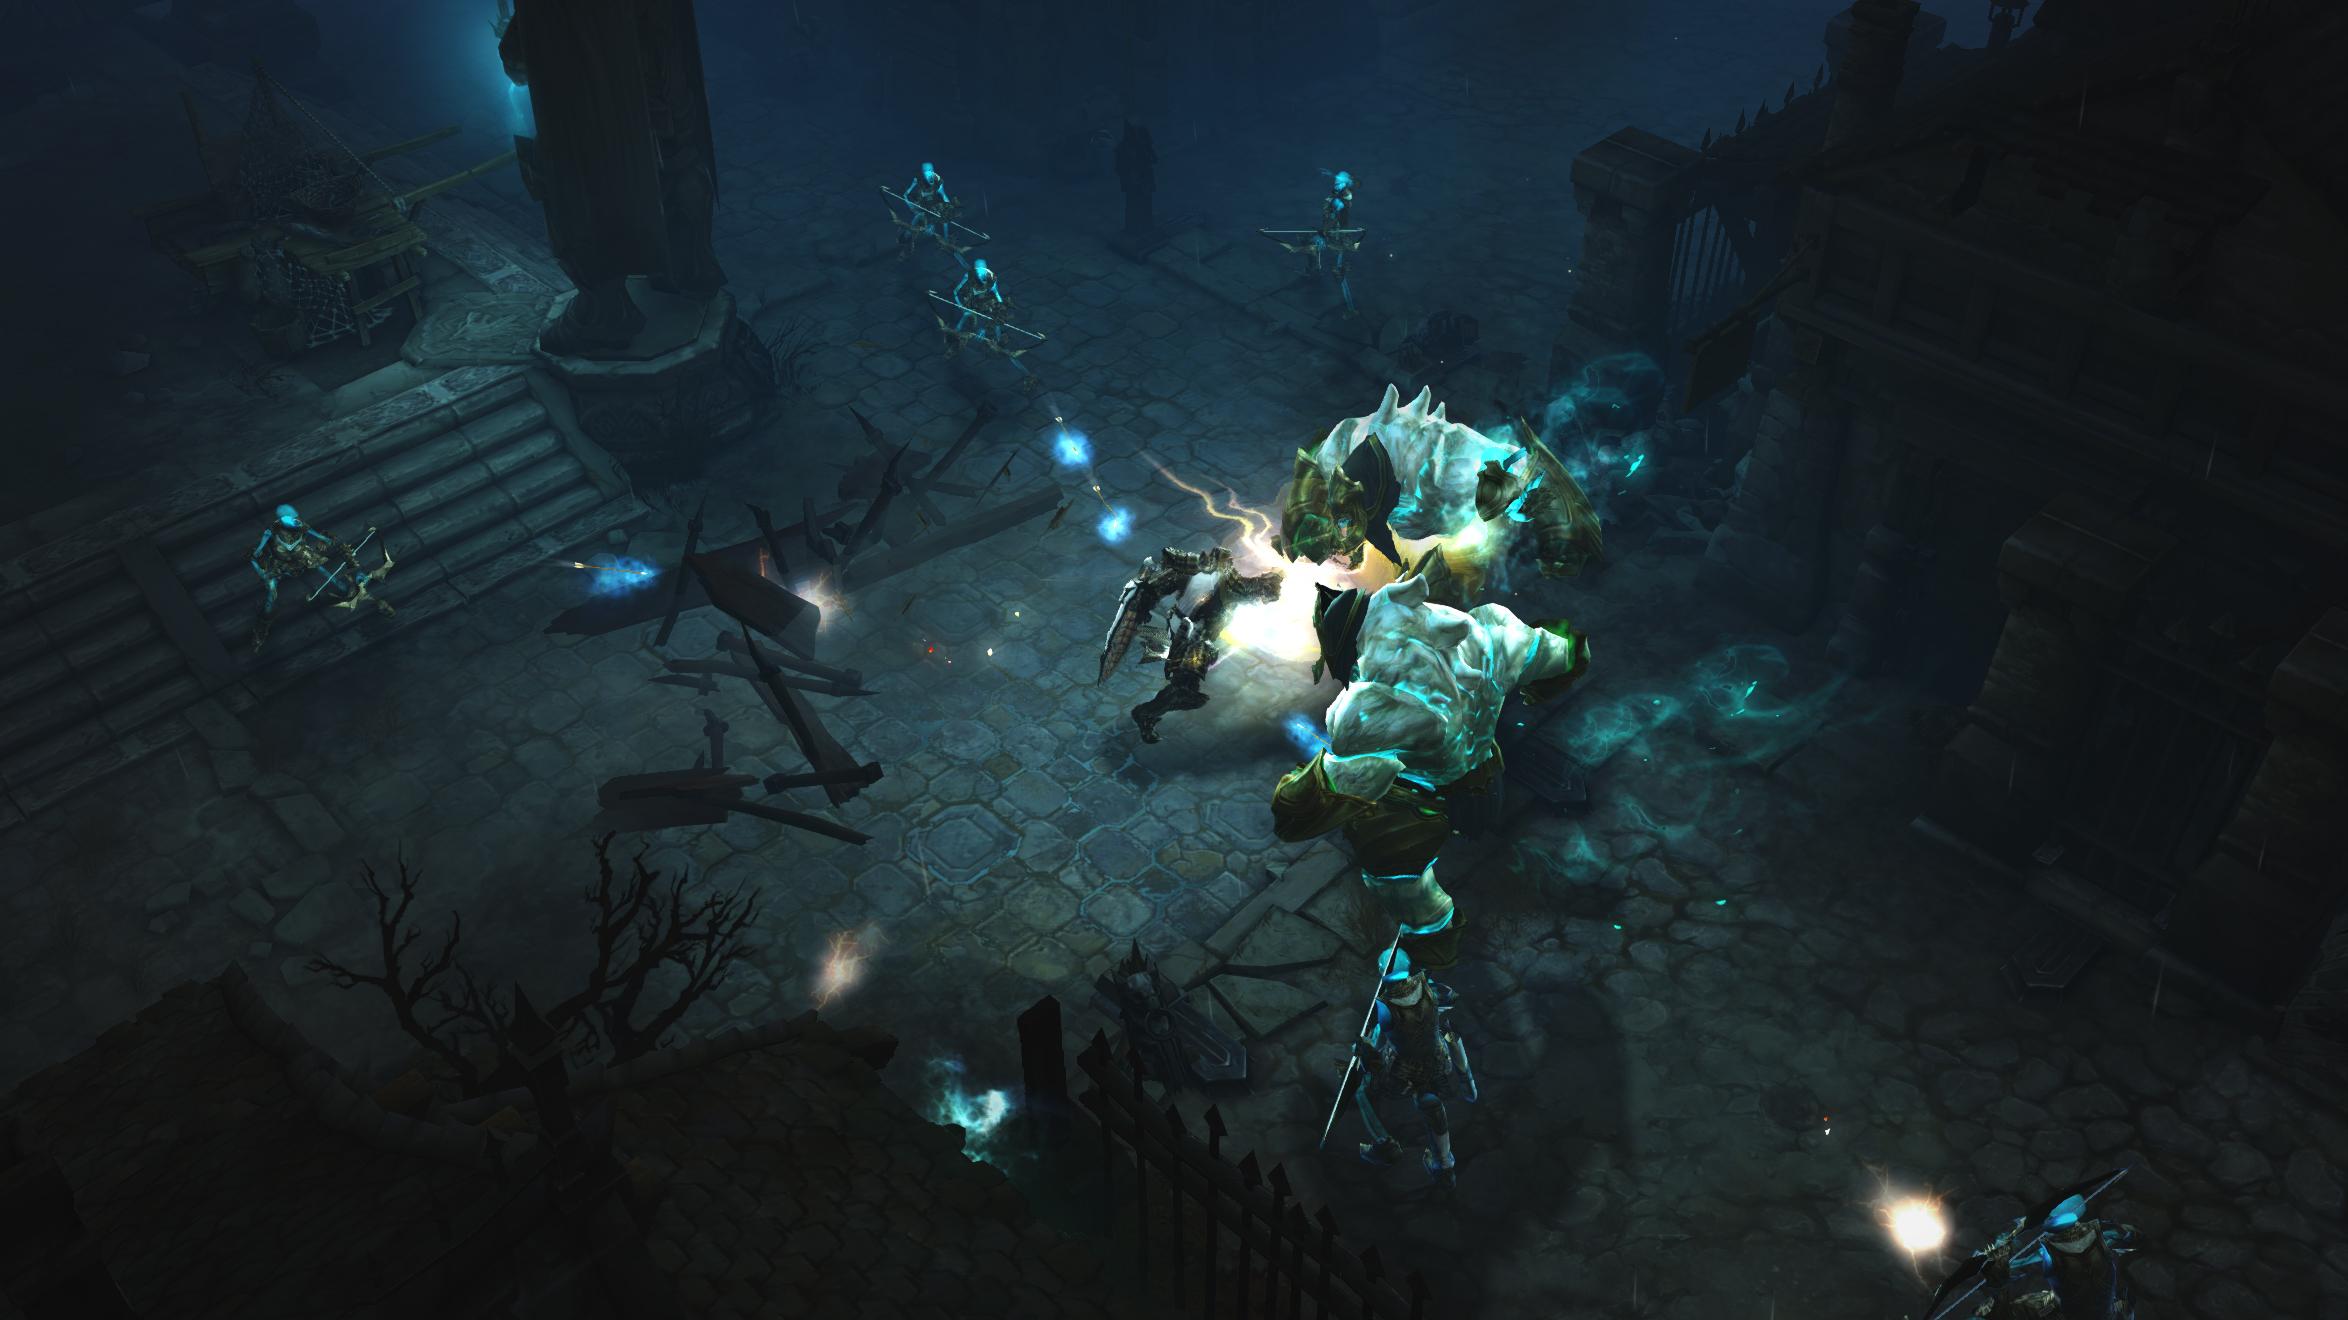 Reaper of souls nouvelle extension de Diablo III 850706825